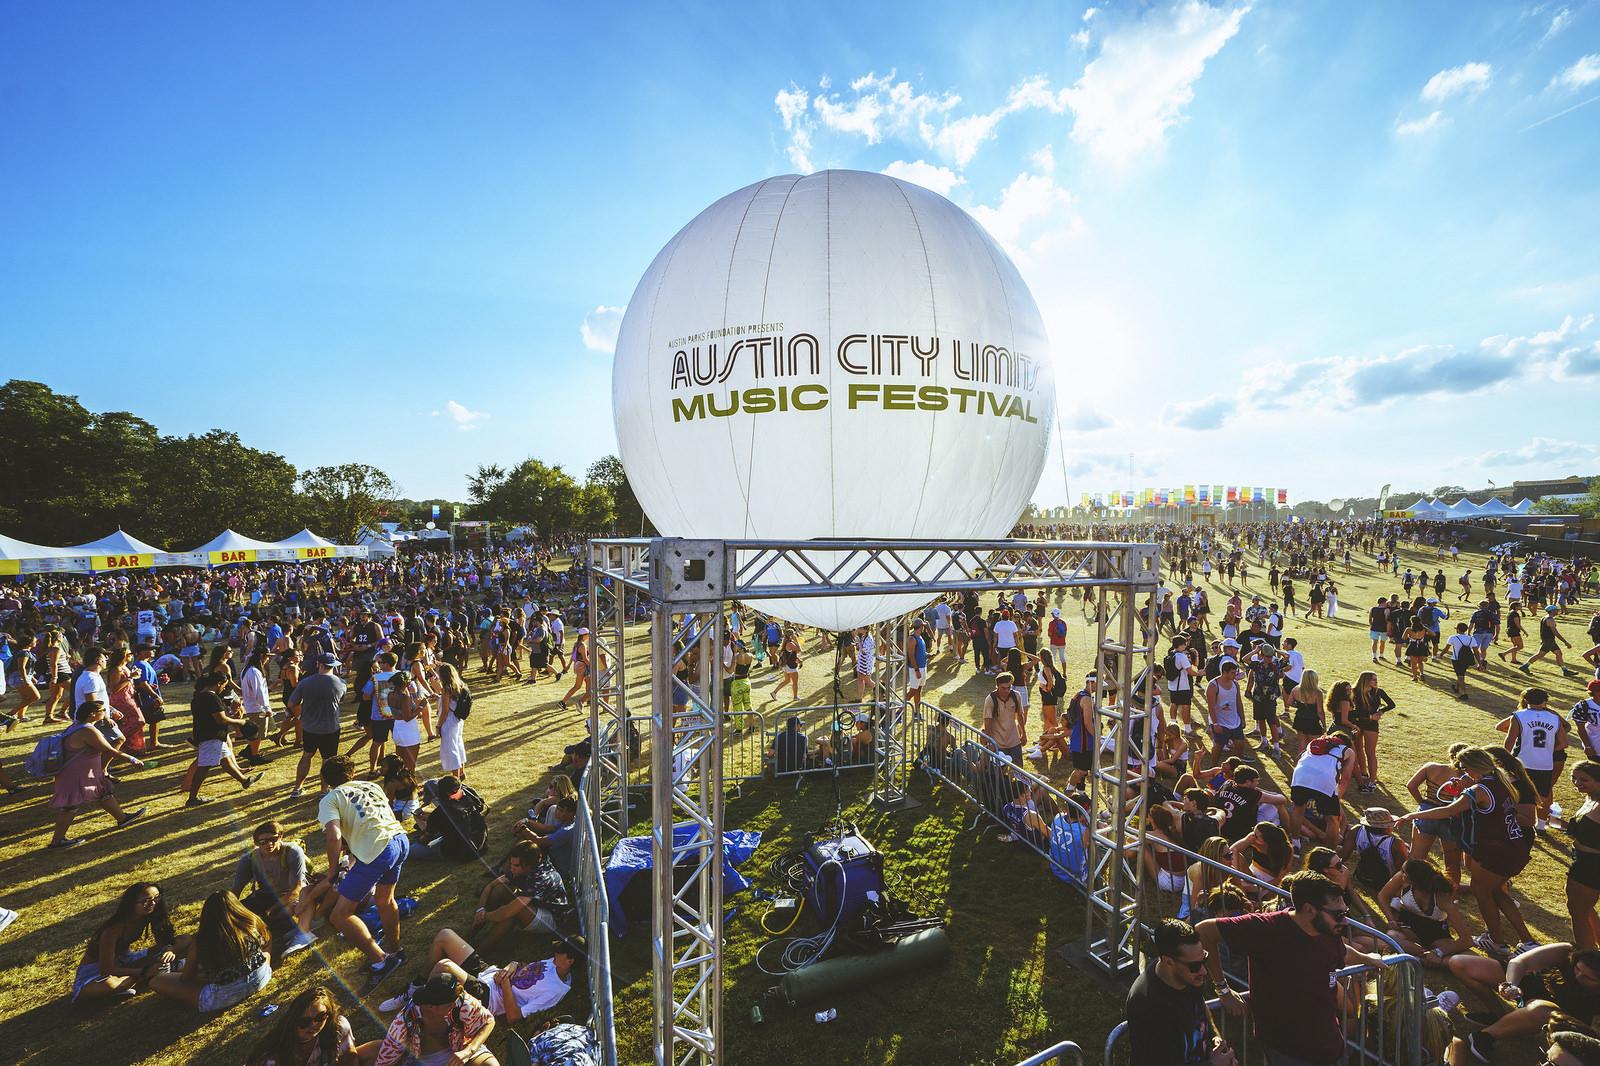 Austin City Limits - Custom VR Experience